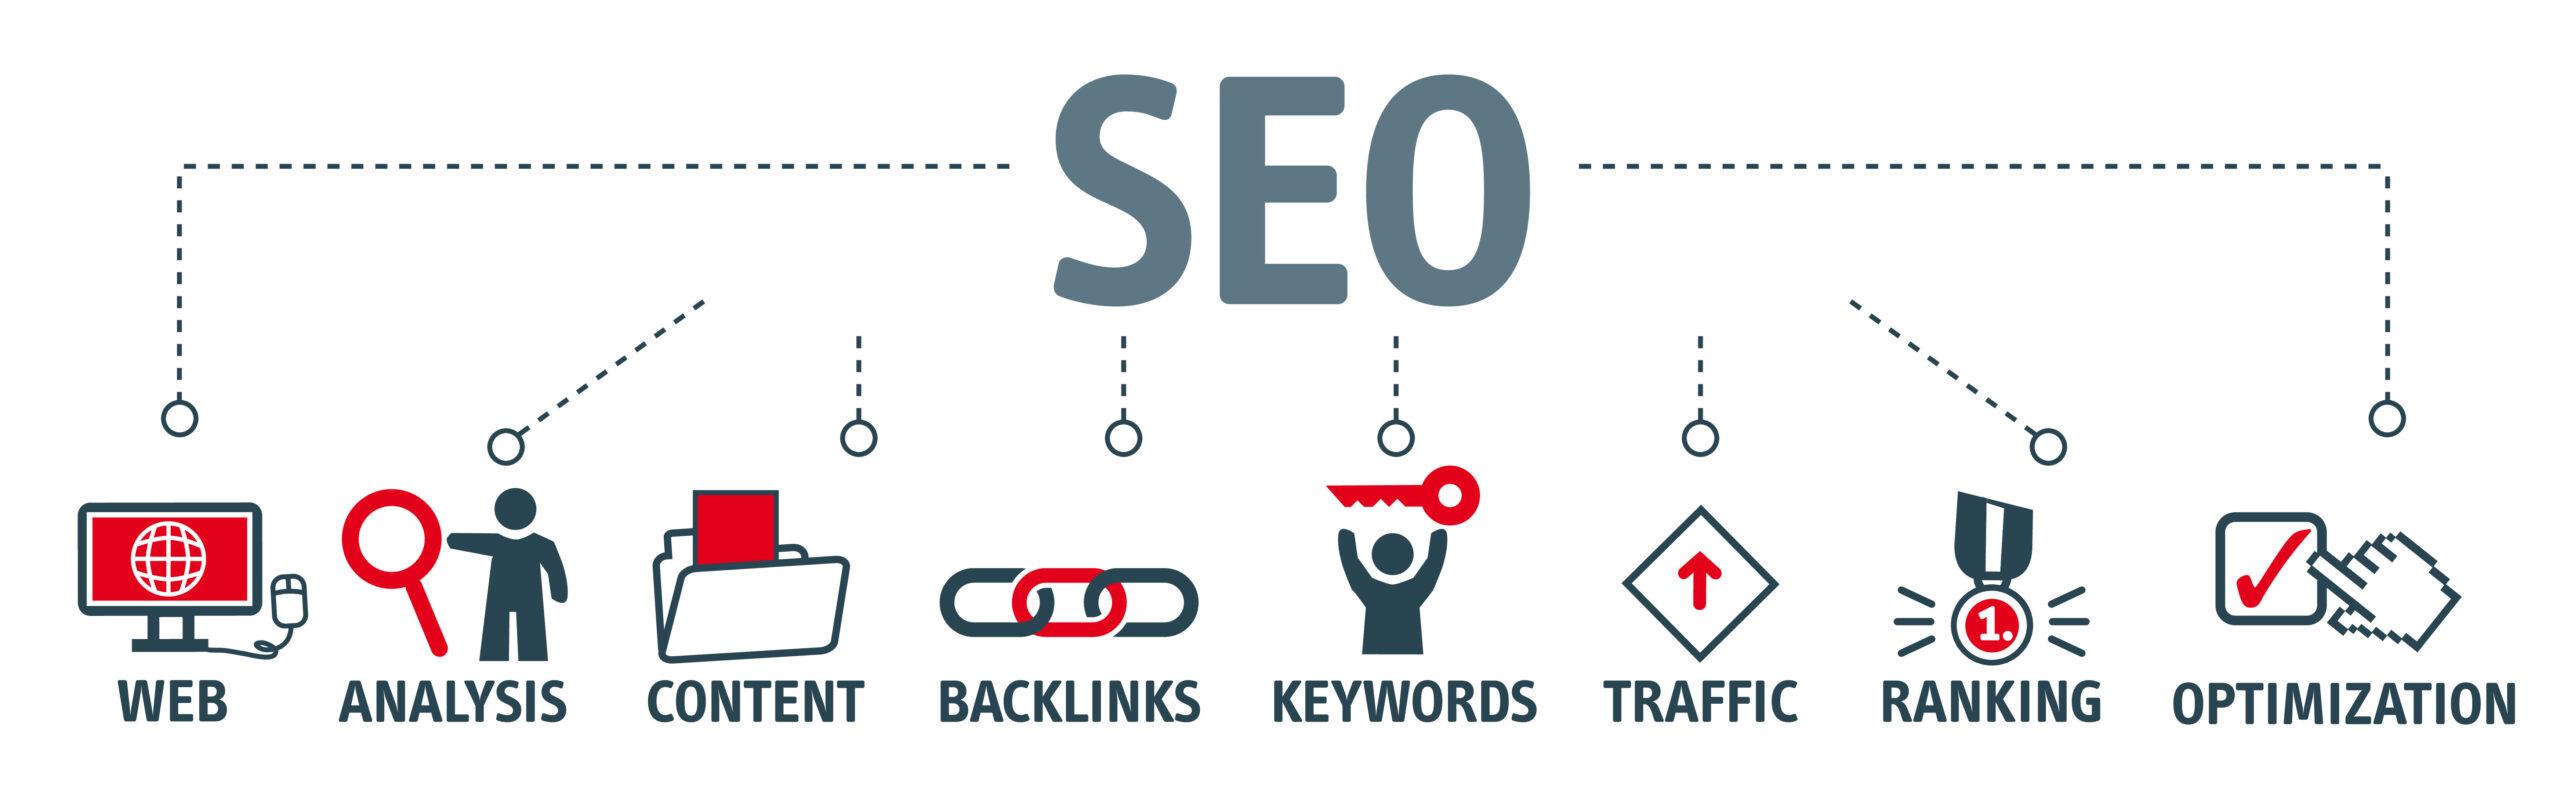 How To Optimize Your Website - SEO Tactics